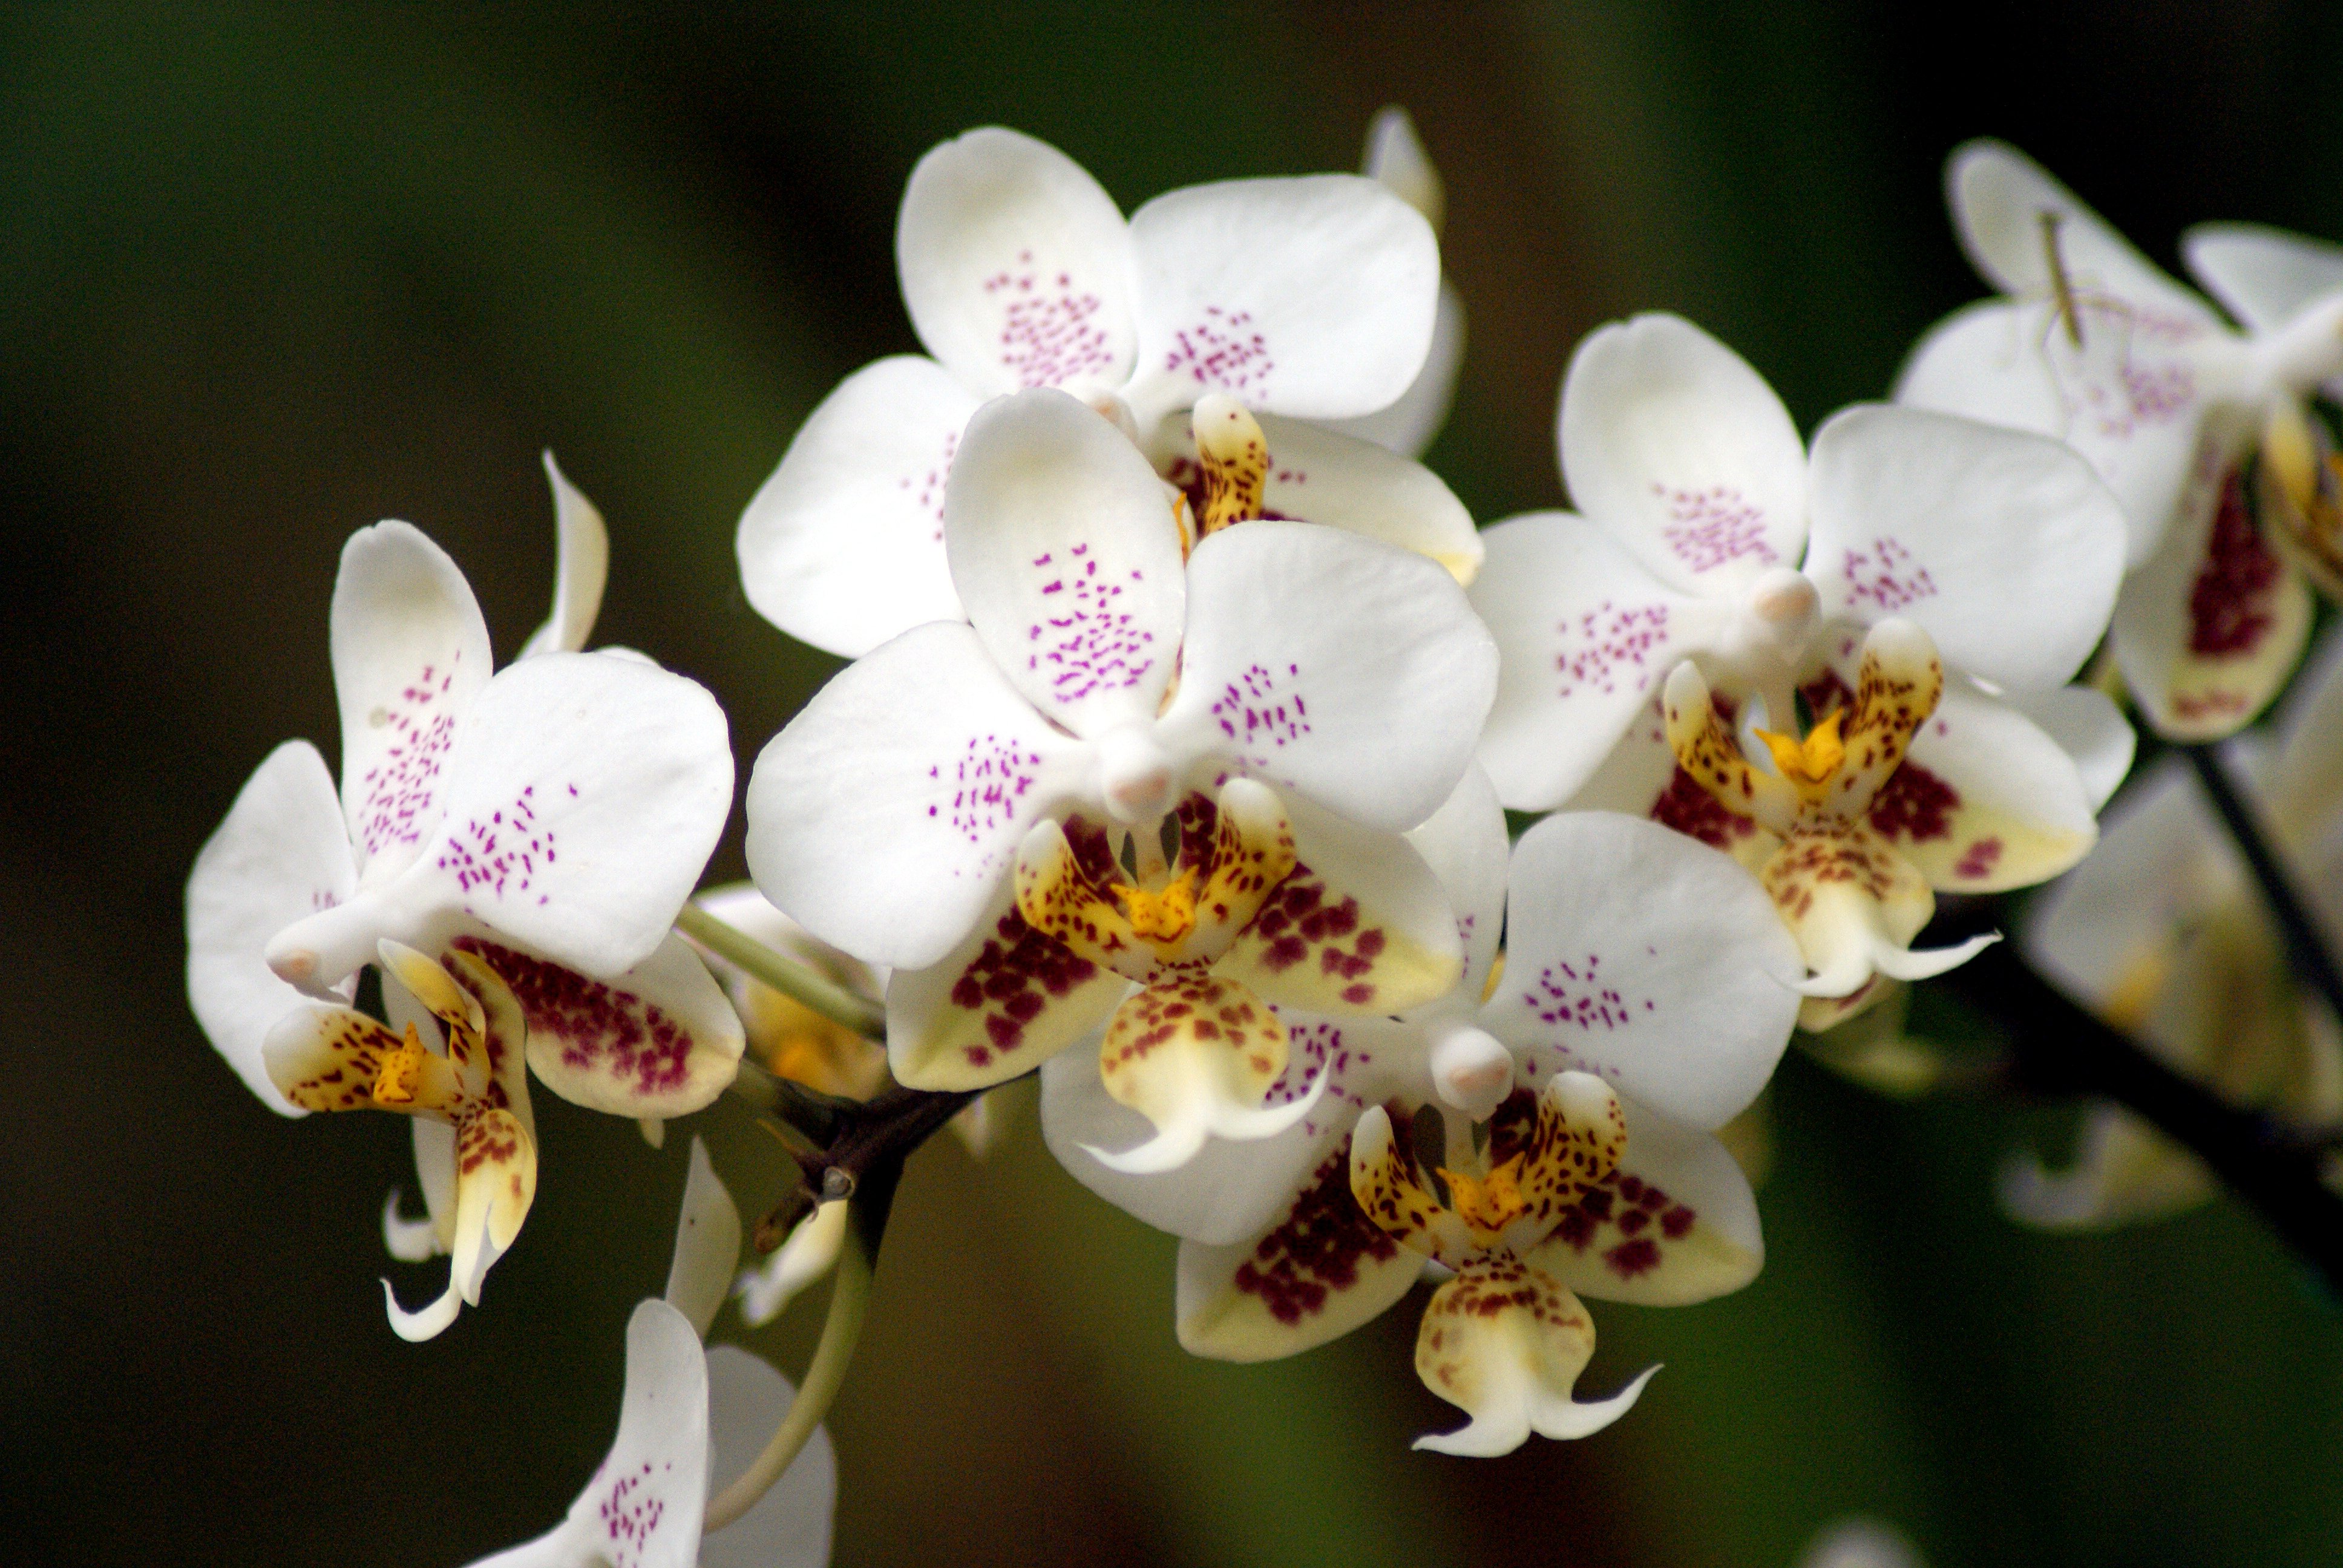 Cat Friendly Flowers - Phalaenopsis